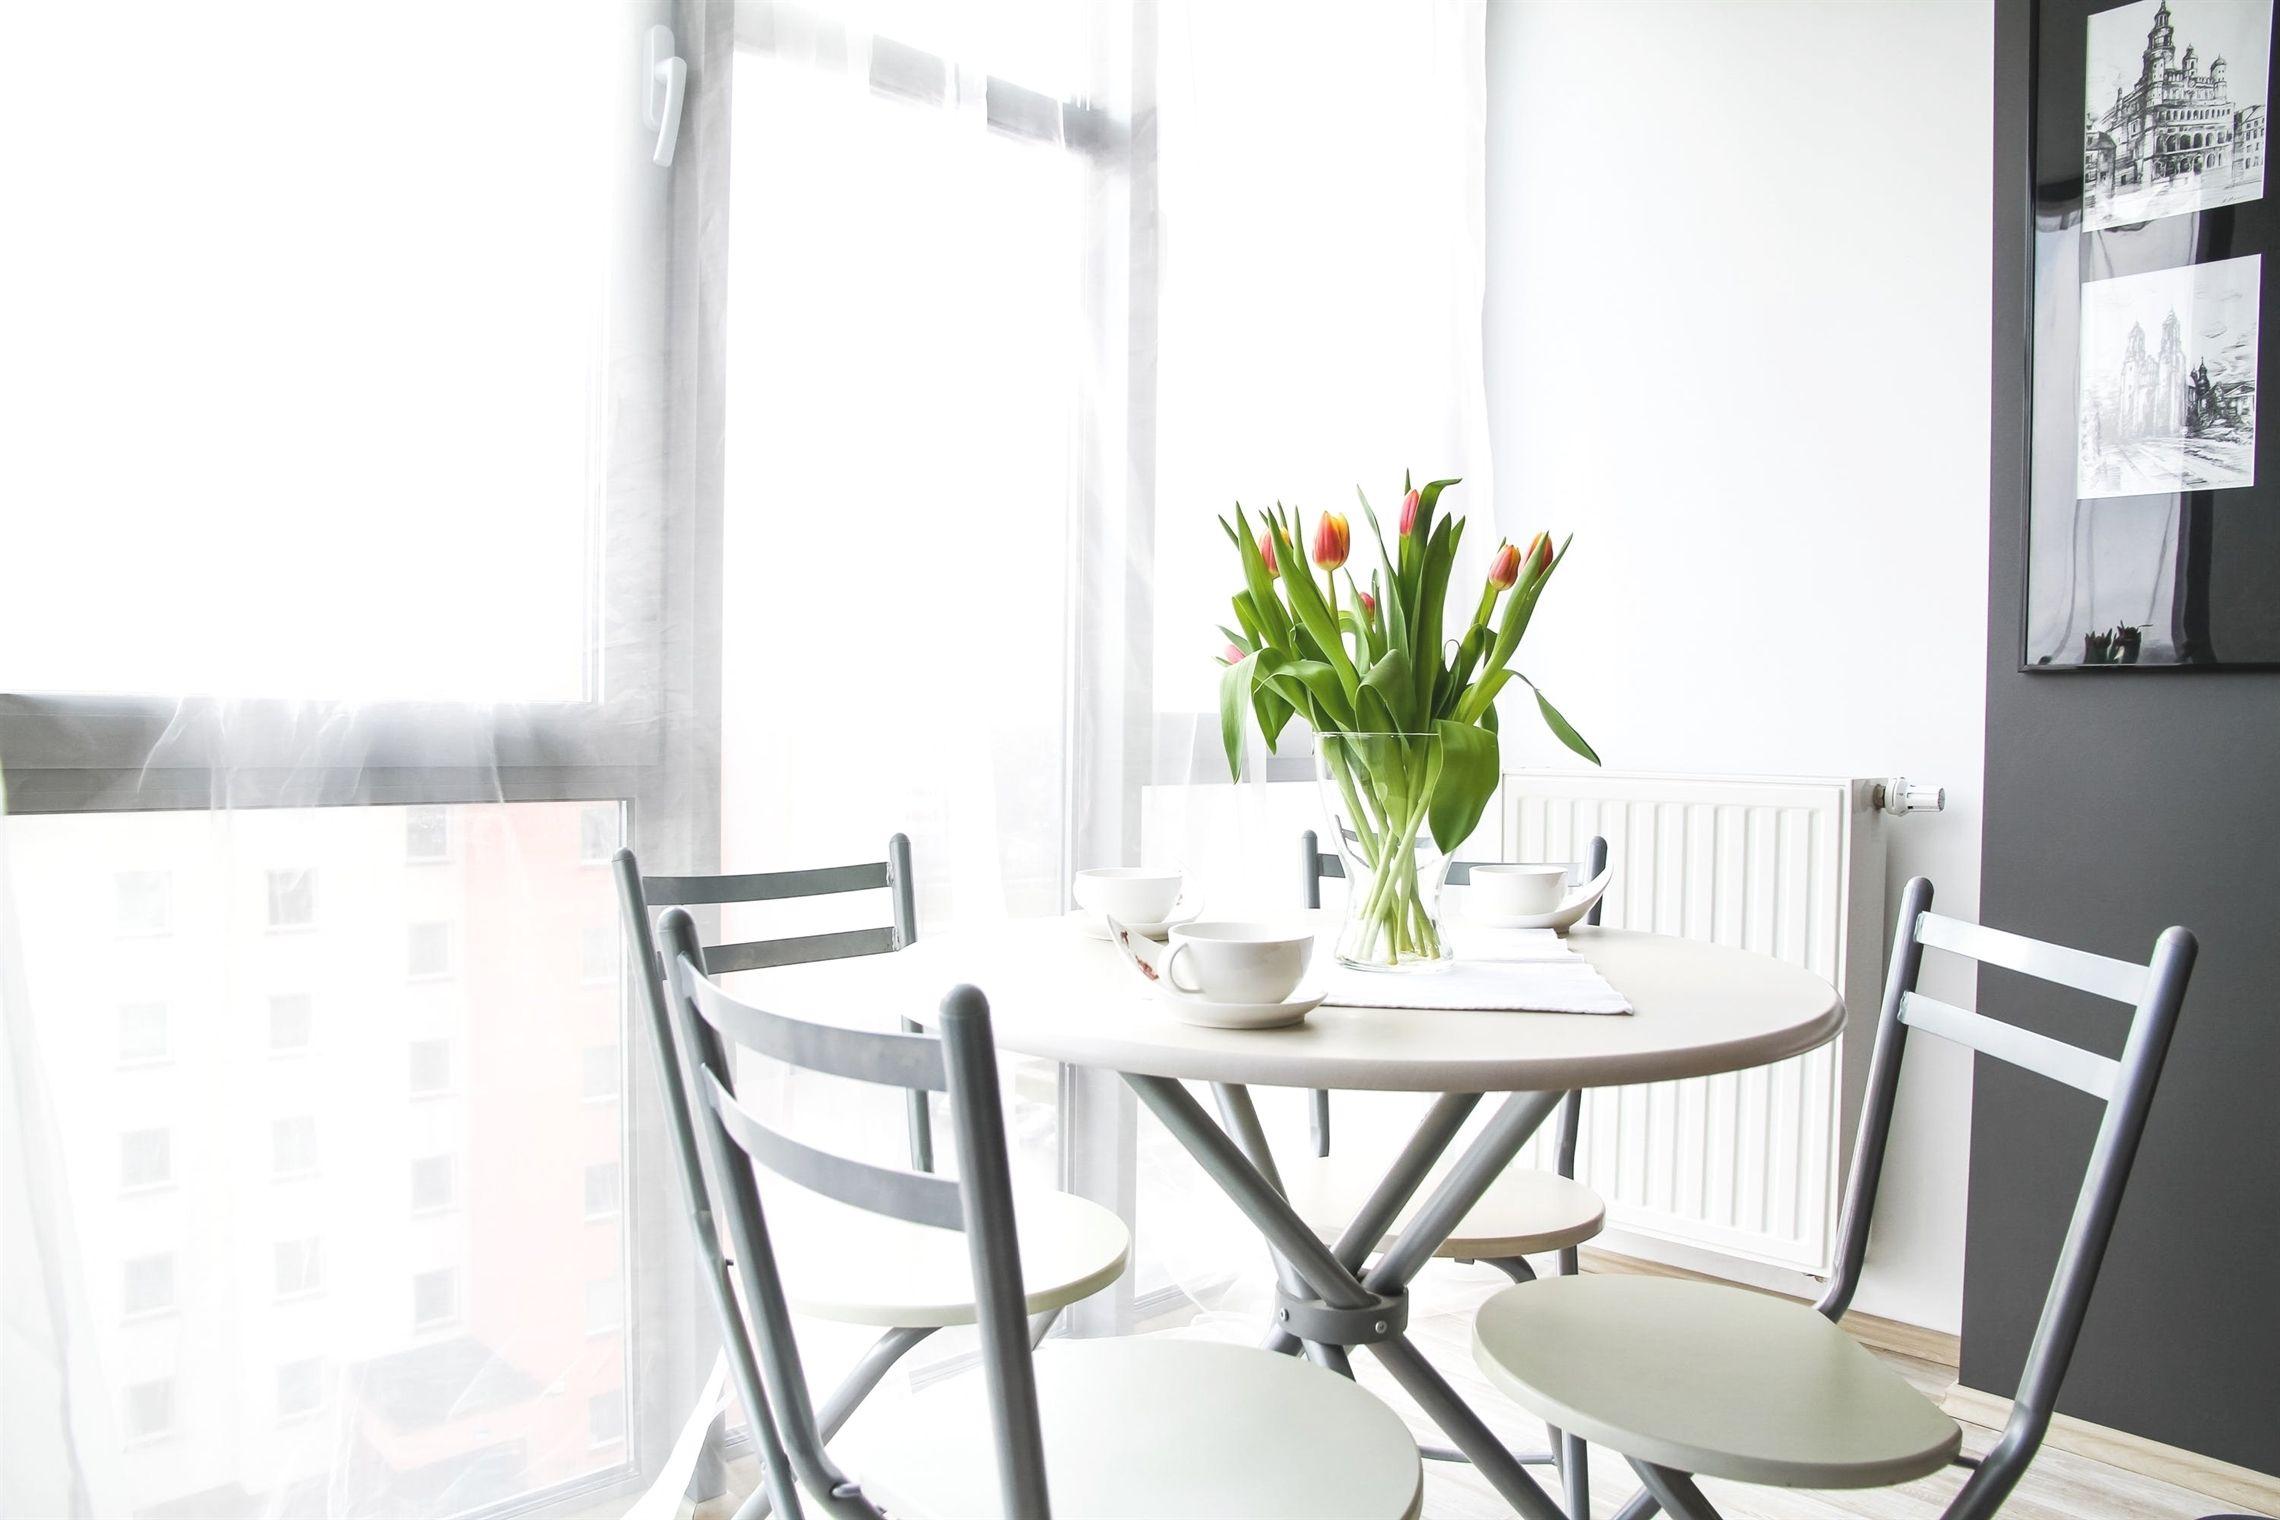 home decor styles 785 20181029114013 62 western home decor catalogs